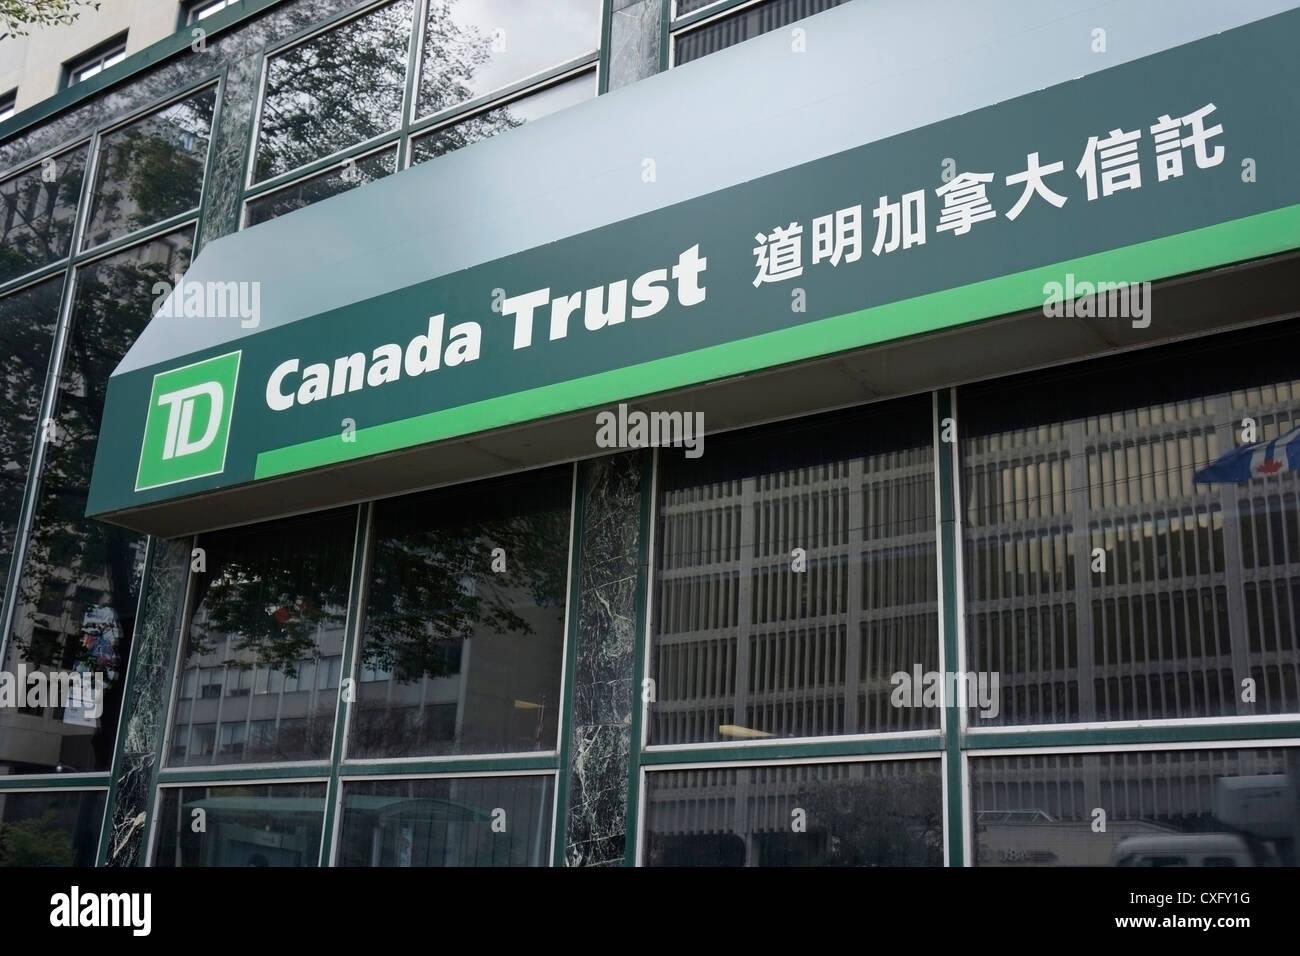 TD Canada Trust, Toronto Stock Photo: 50752284 - Alamy